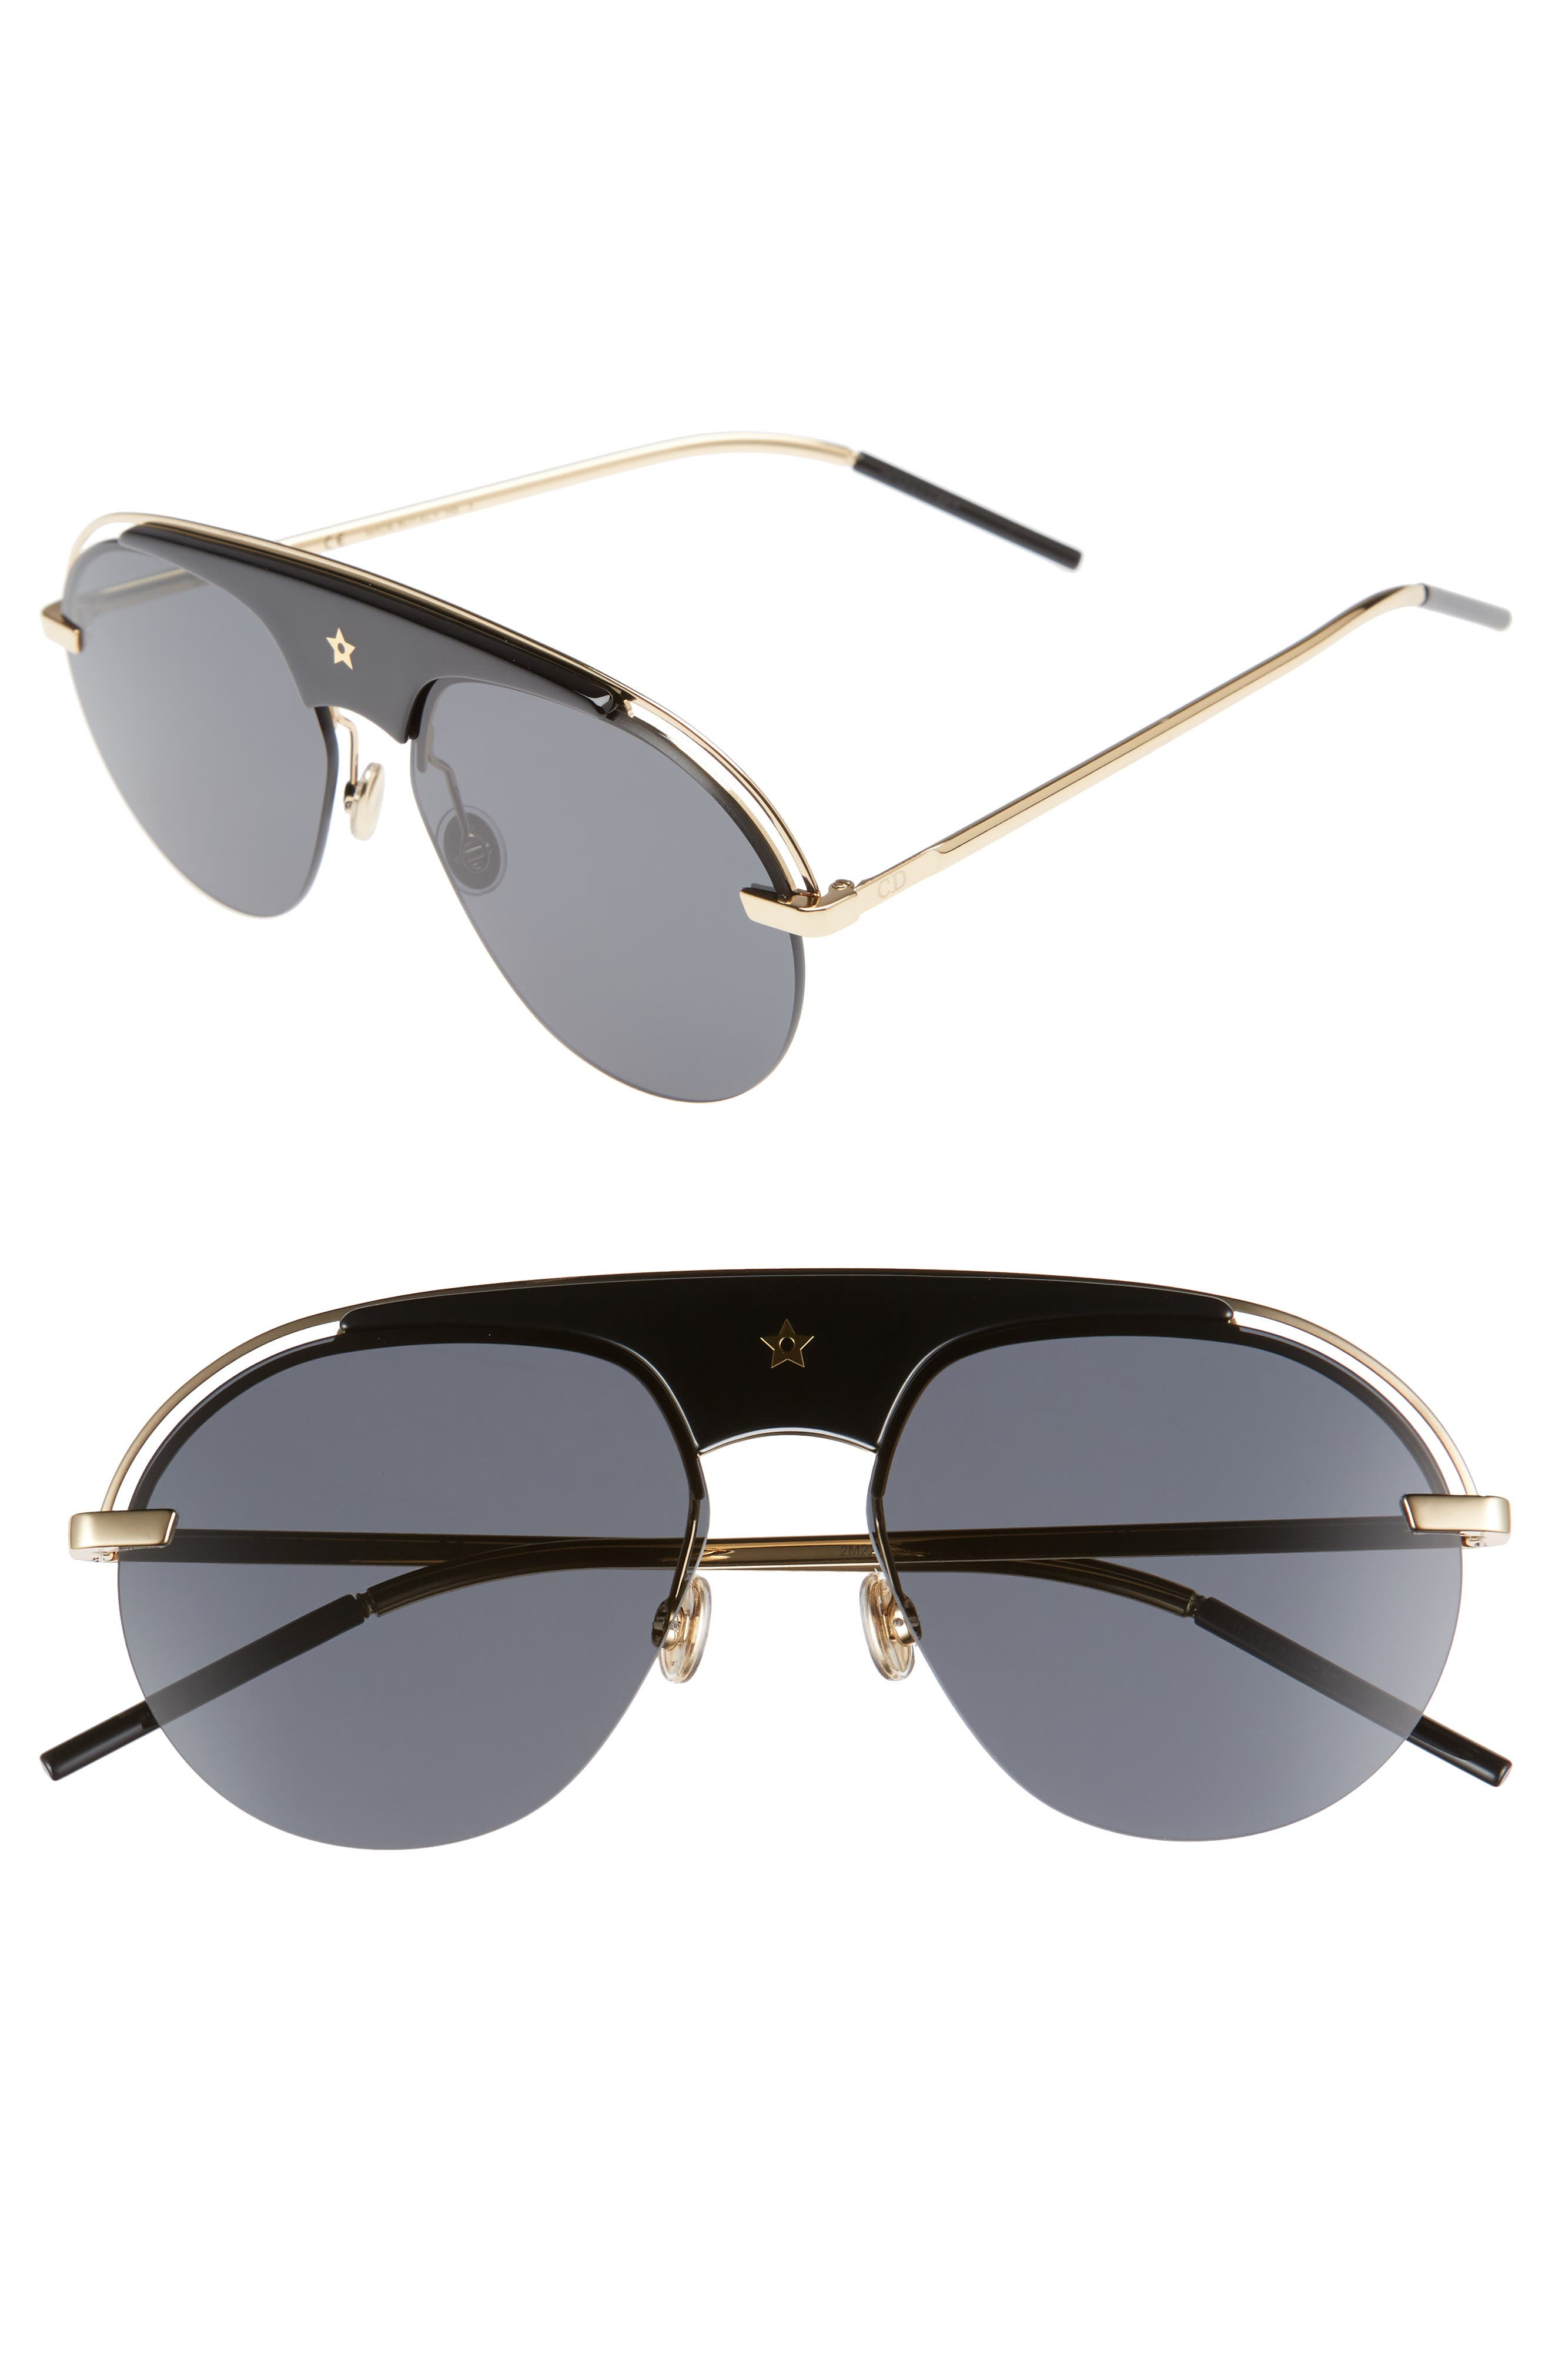 Christian Dior Revolution 58mm Aviator Sunglasses